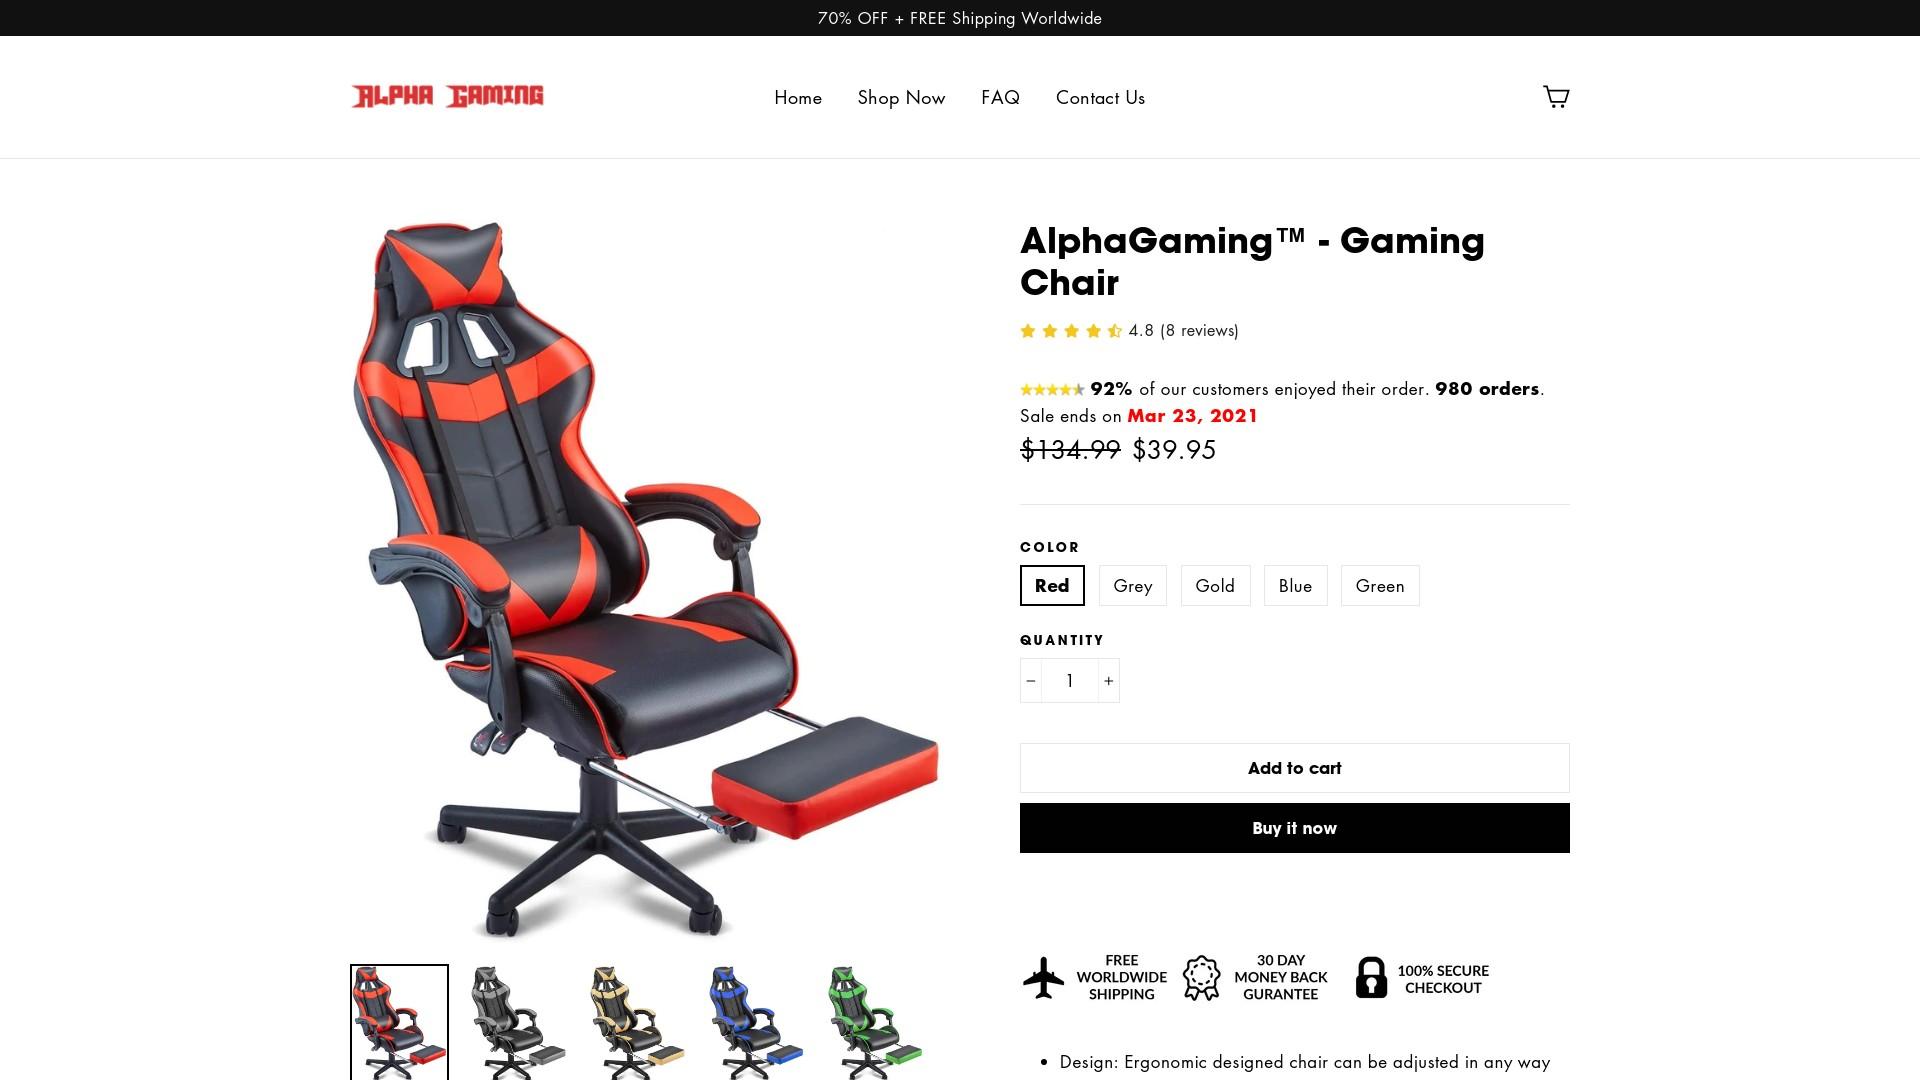 Alphagamingtm Reviews – alphagamingtm.com Online Store Is Scam or Legit?